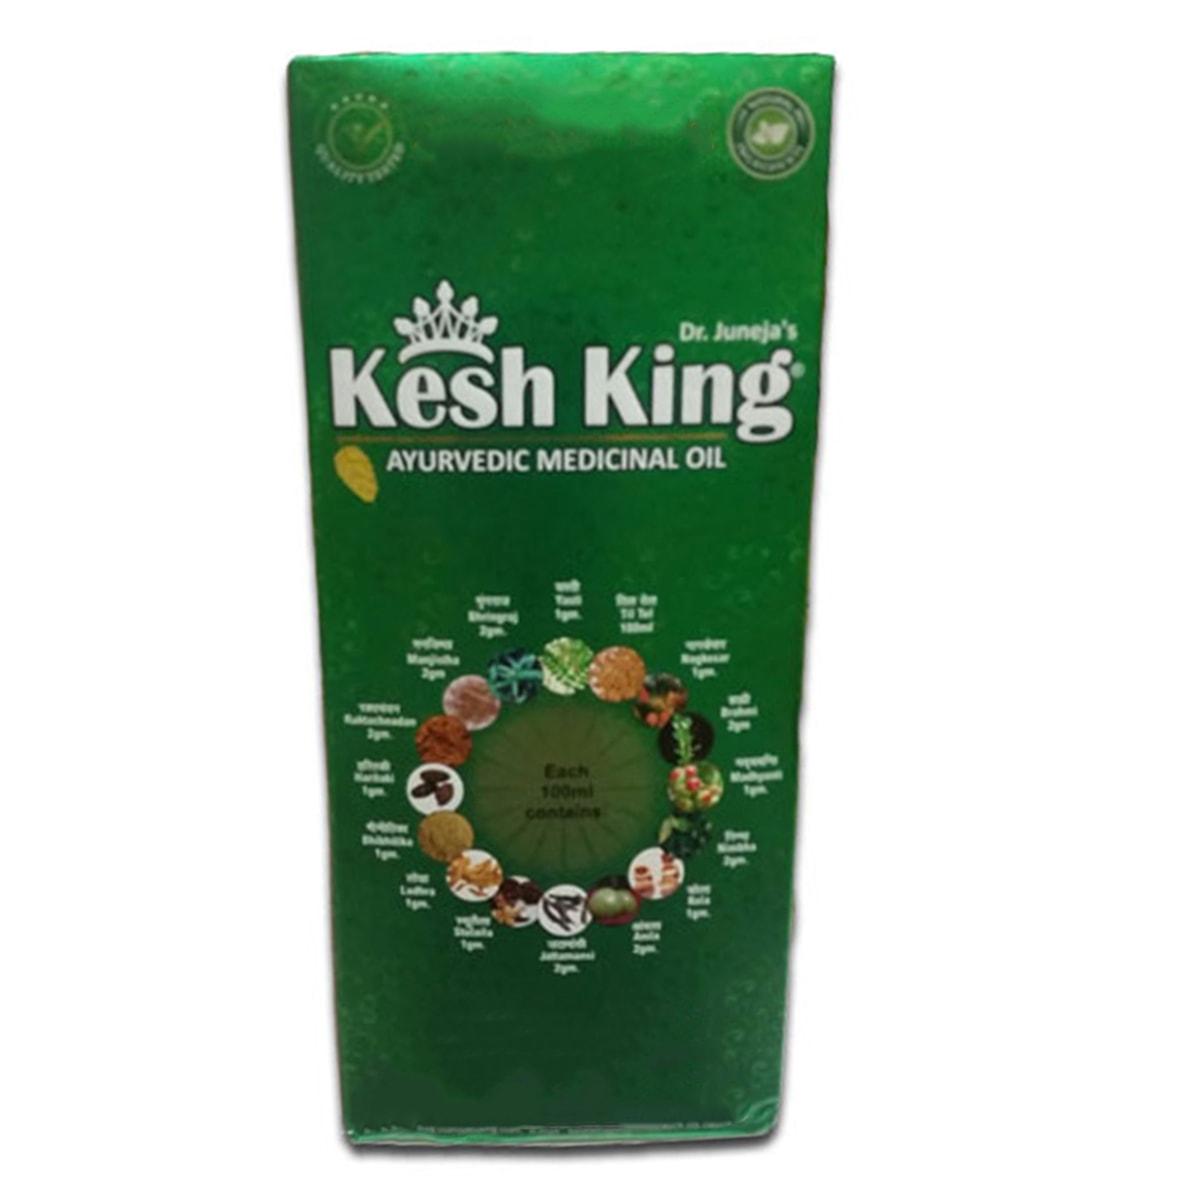 Buy Kesh King Ayurvedic Medicinal Oil by Dr Juneja - 300 ml